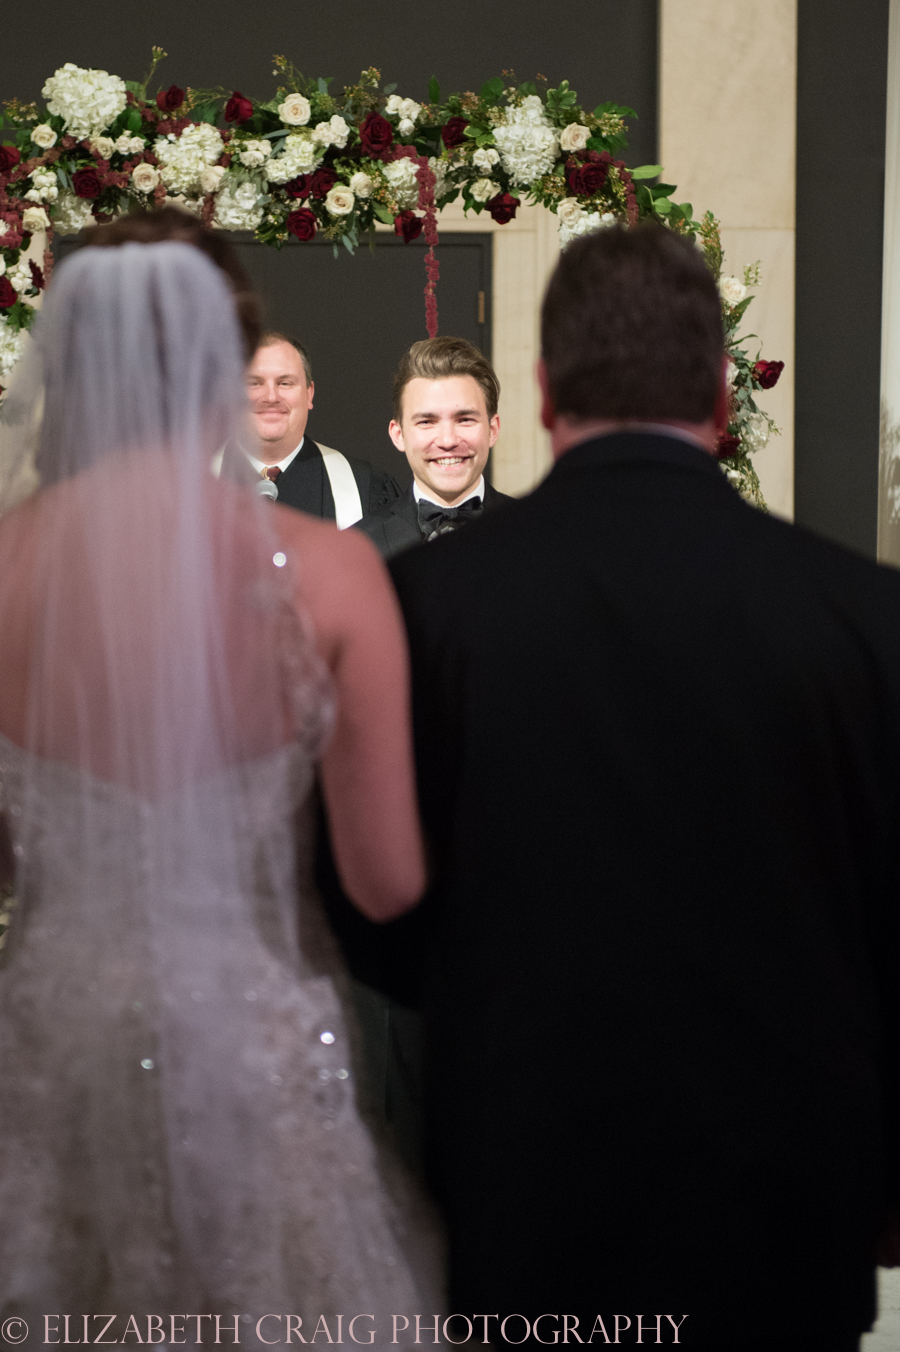 Carnegie Museum of Art Weddings | Elizabeth Craig Photography-0058